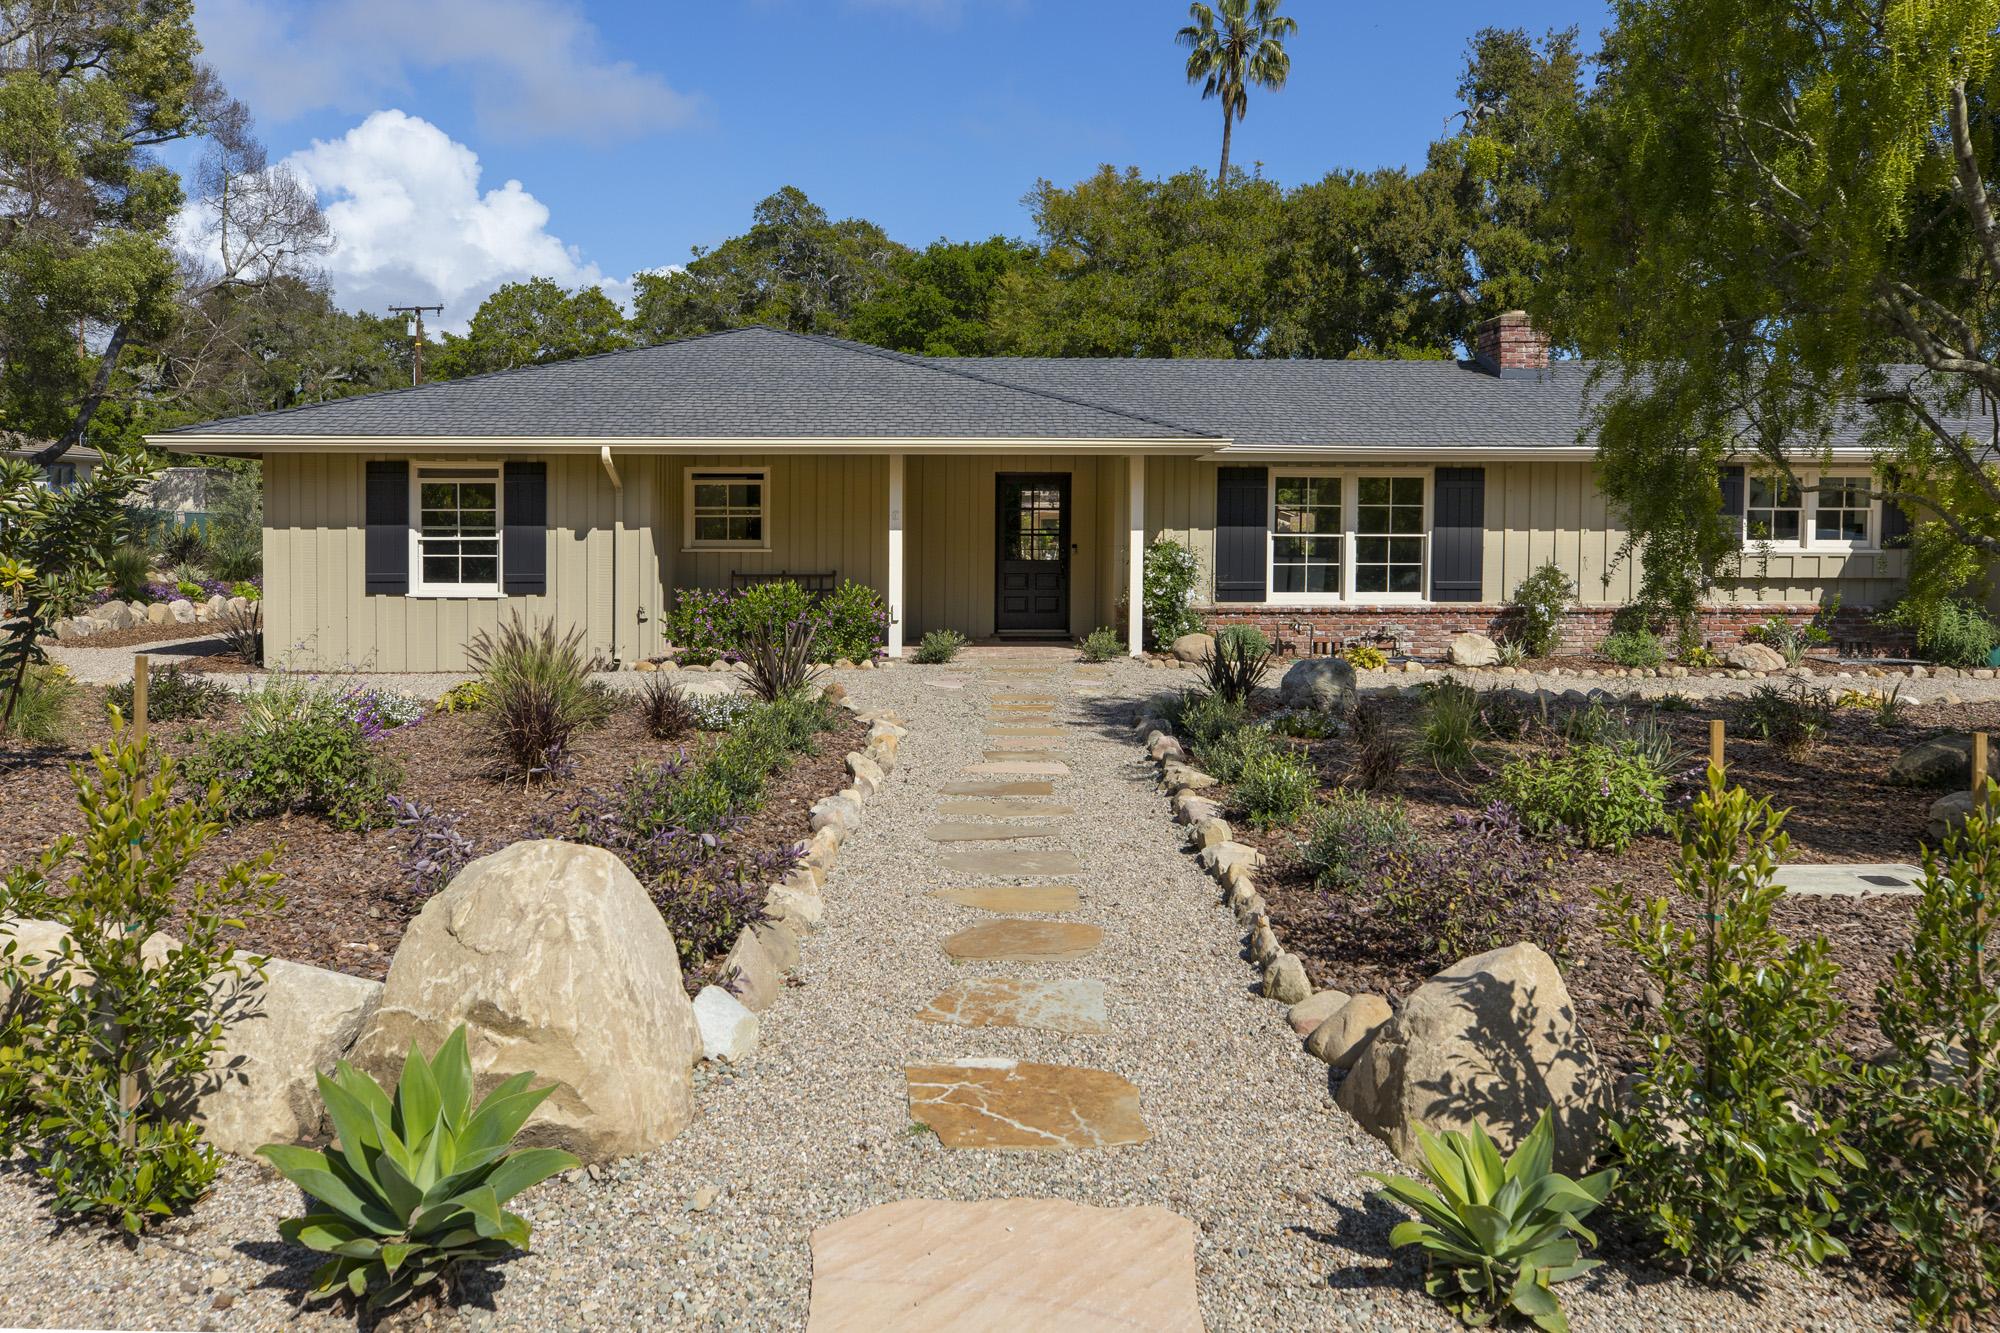 Montecito Oaks - $2,300,000